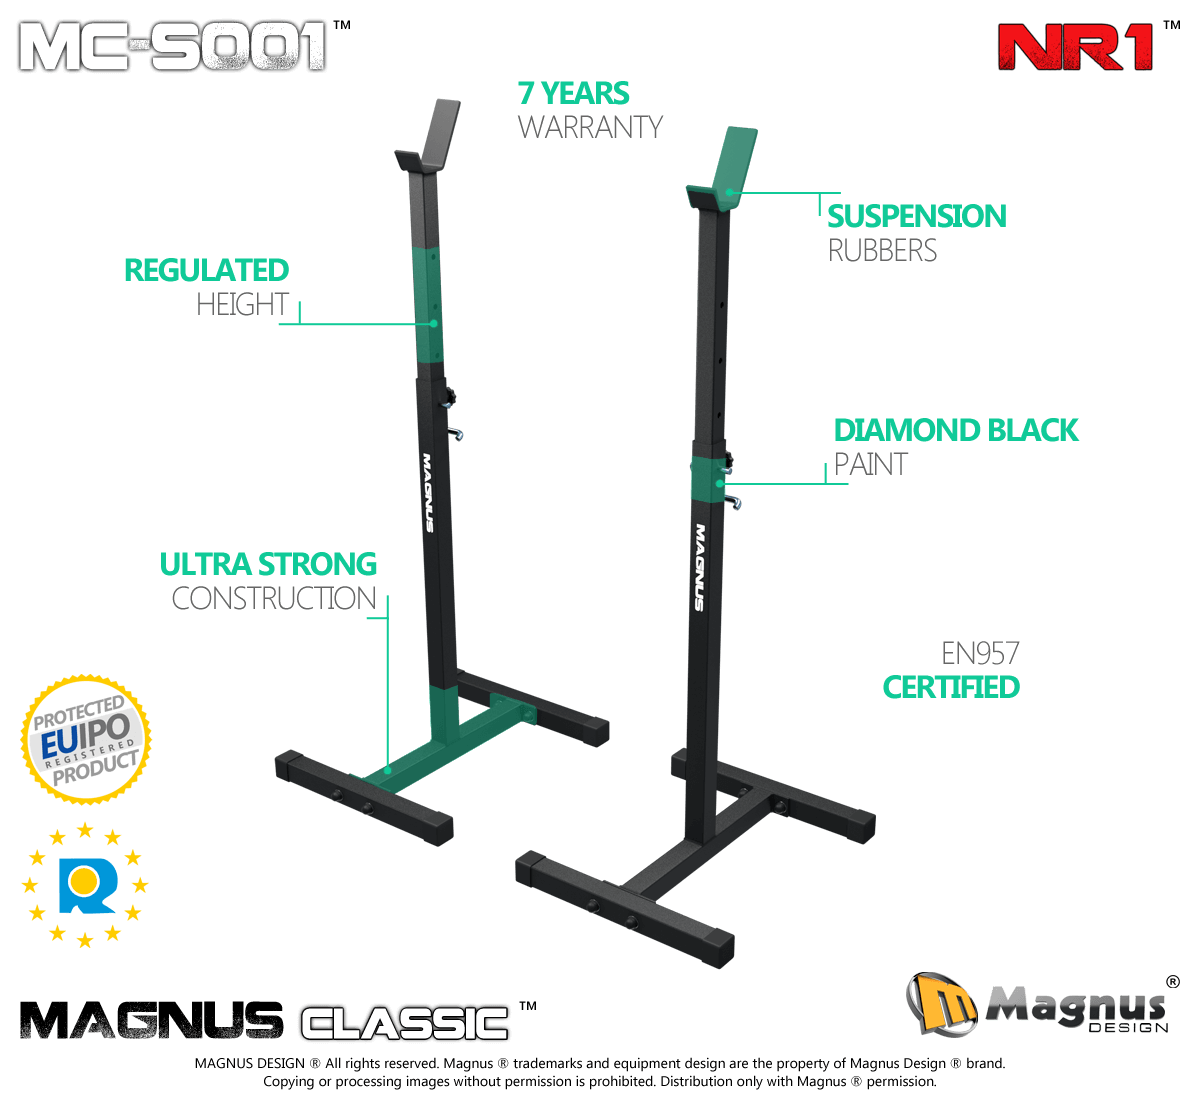 Newest - traing safe thanks to Magnus squat racks for gym exercises